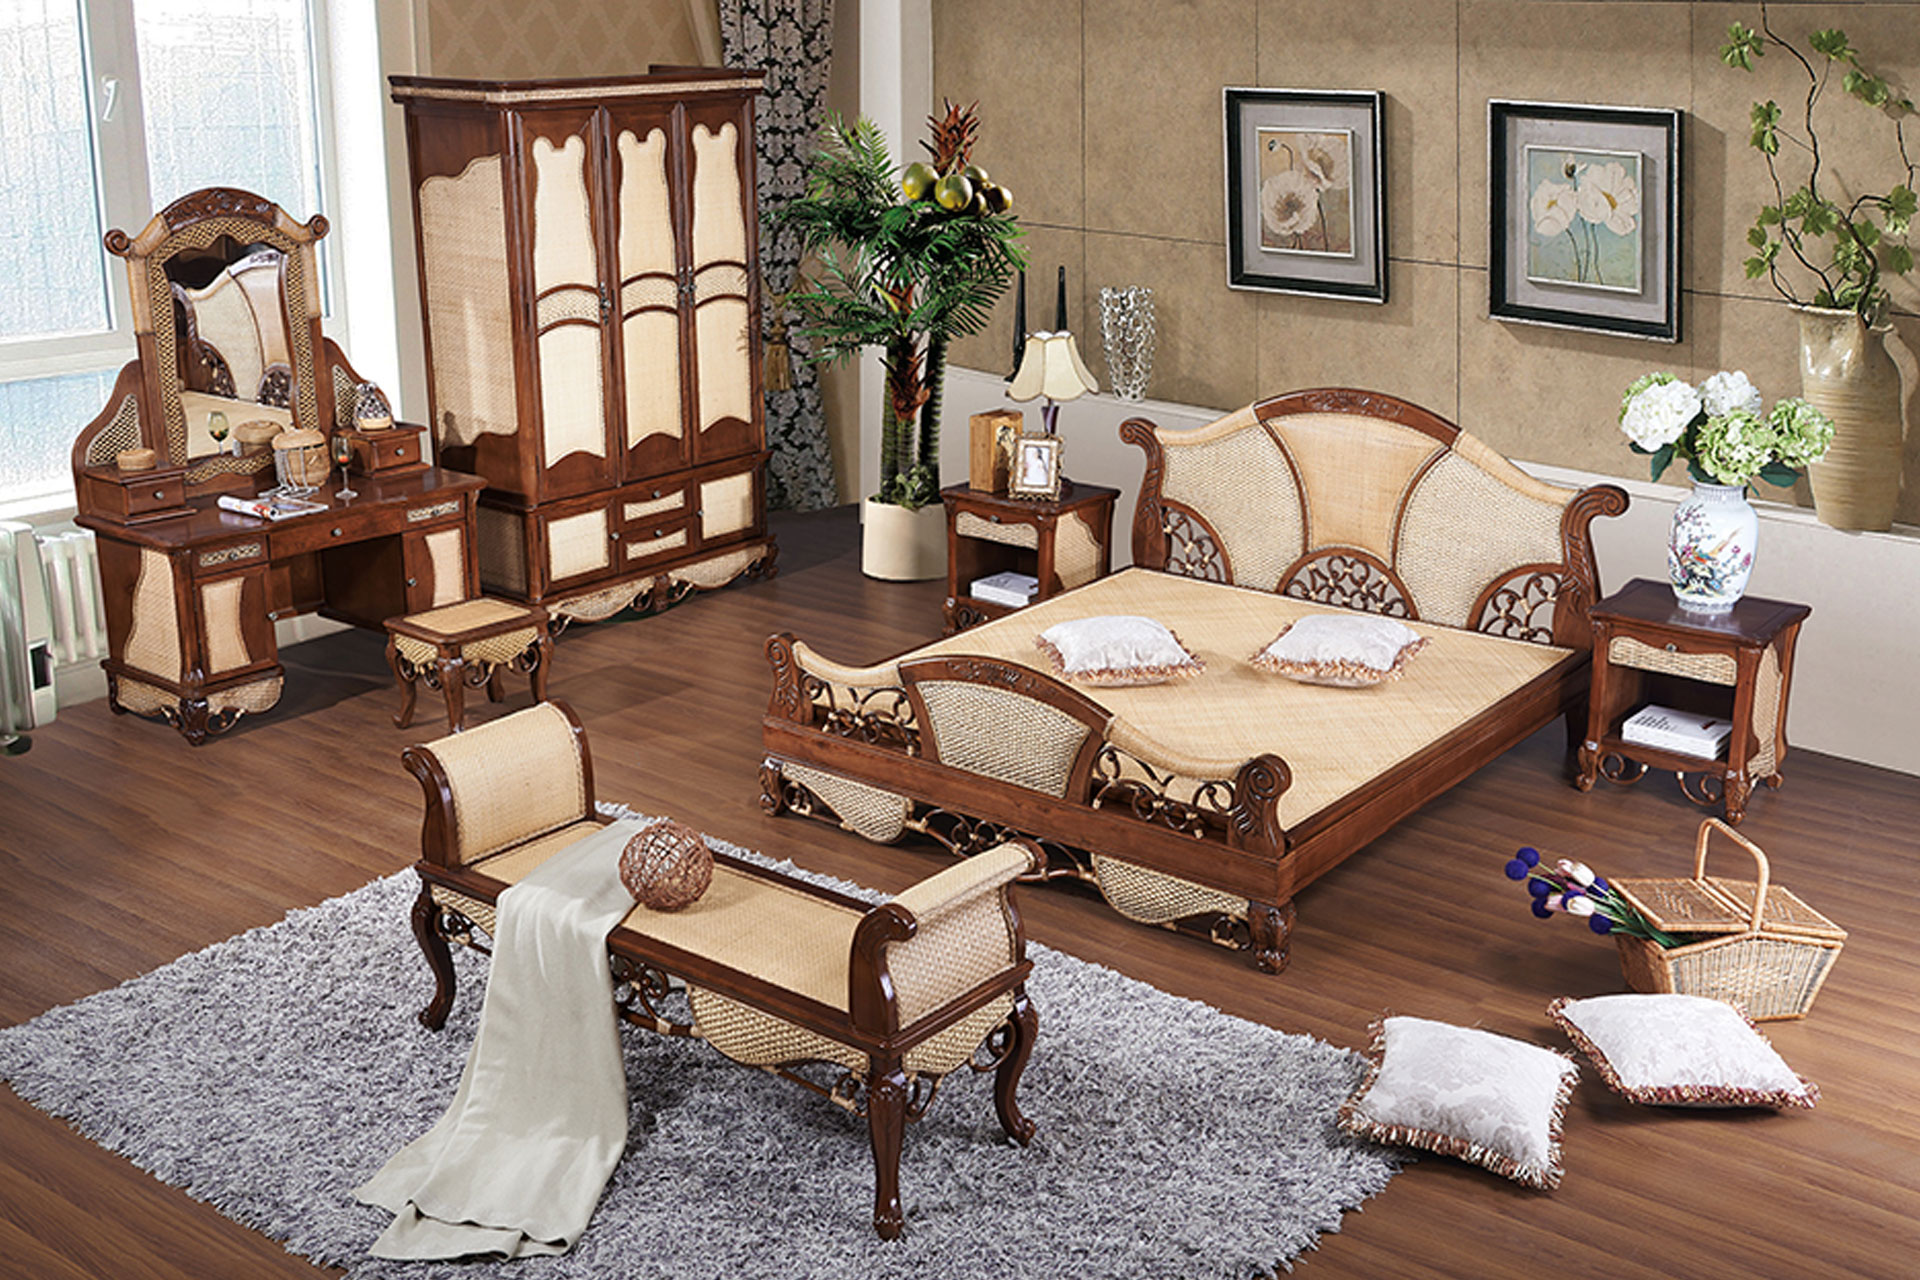 rattan-furniture-slide2